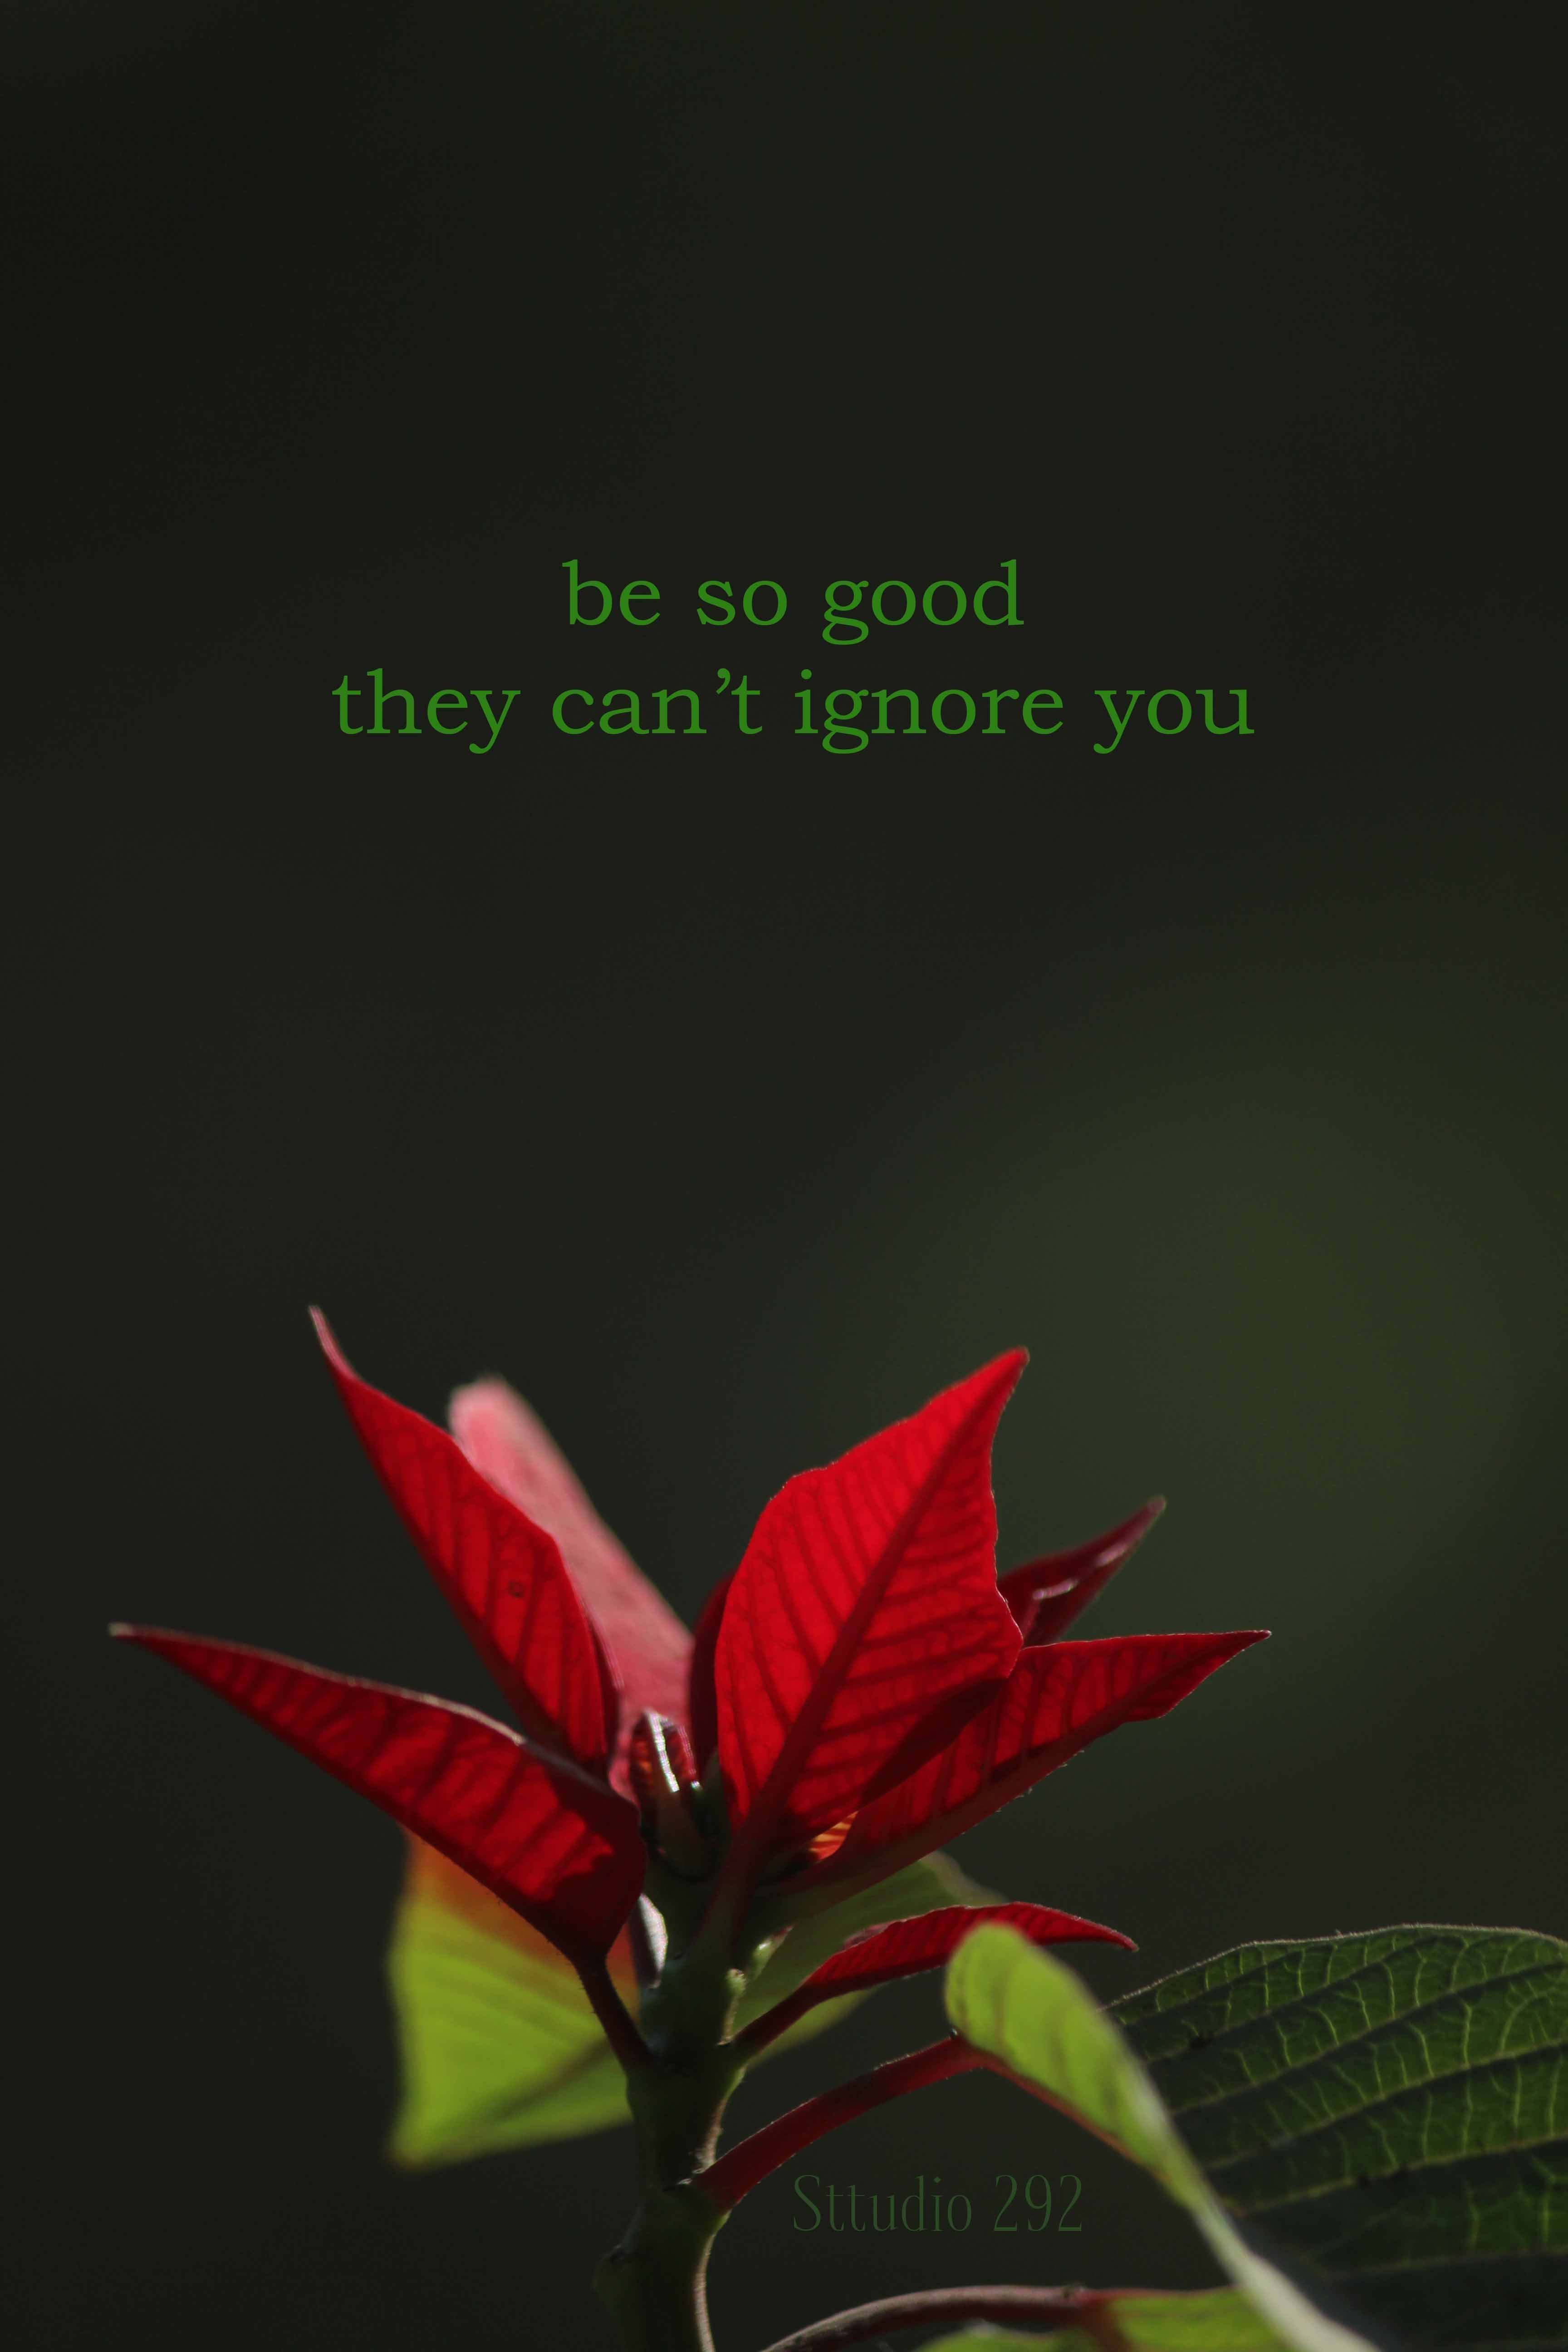 Poinsettia inspirational quotes for 2018 beautiful flowers poinsettia inspirational quotes for 2018 beautiful flowers beautiful flowers with quotes flower izmirmasajfo